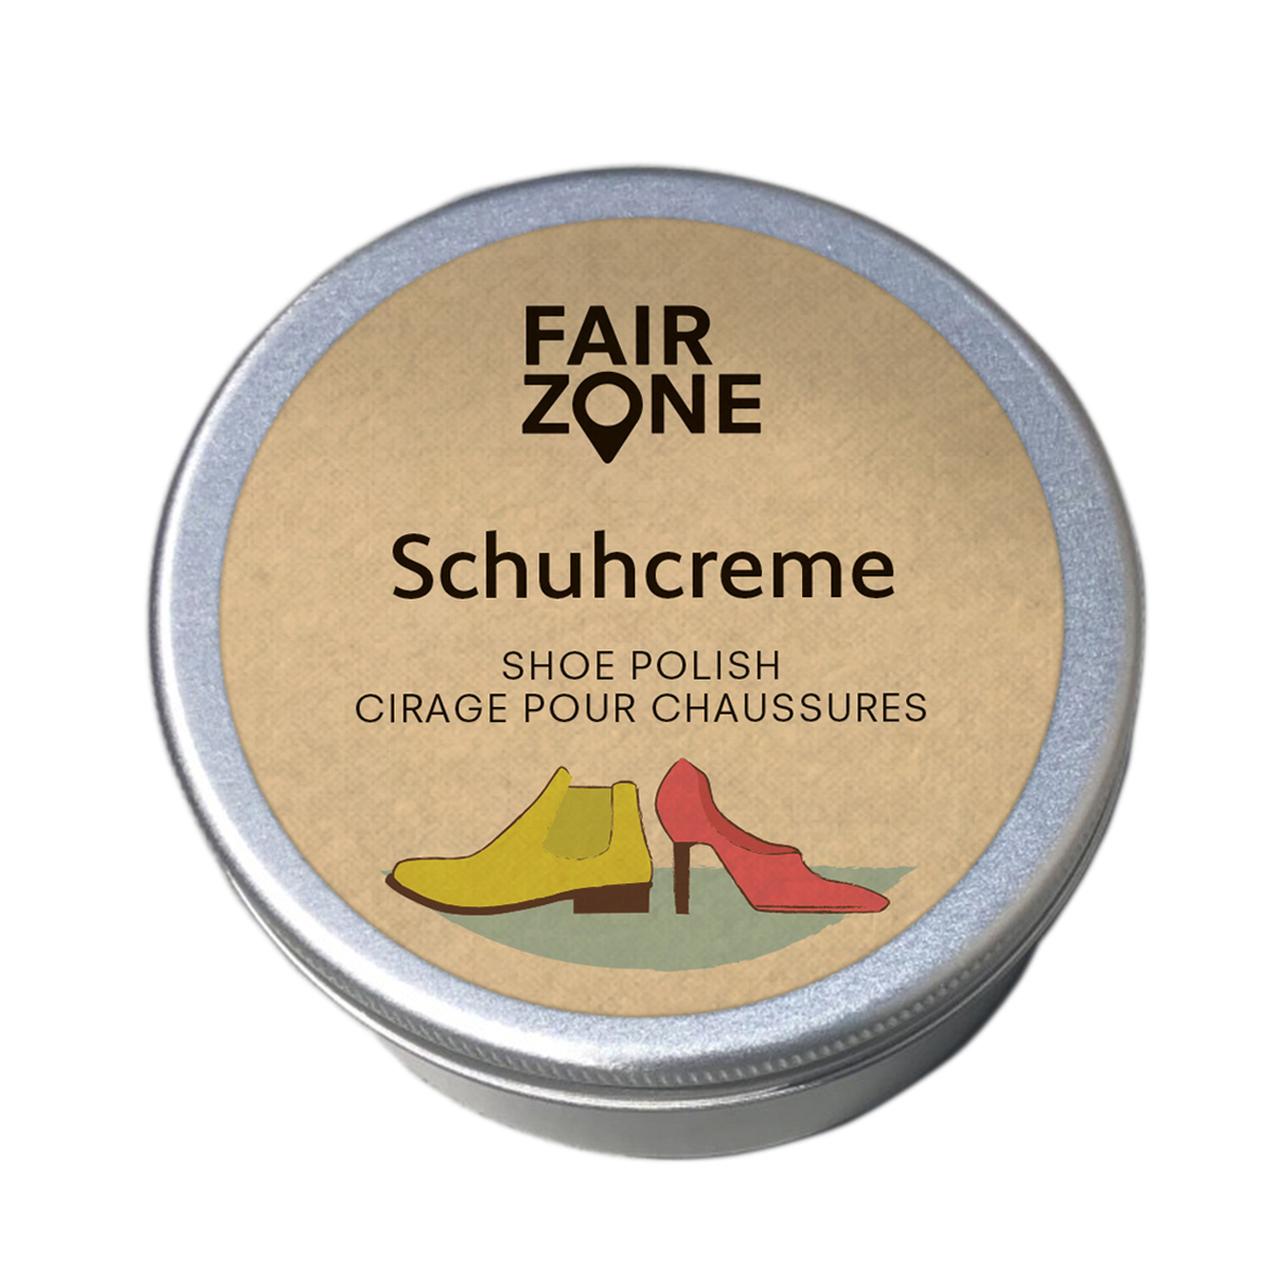 FAIR ZONE Schuhpomade 100ml